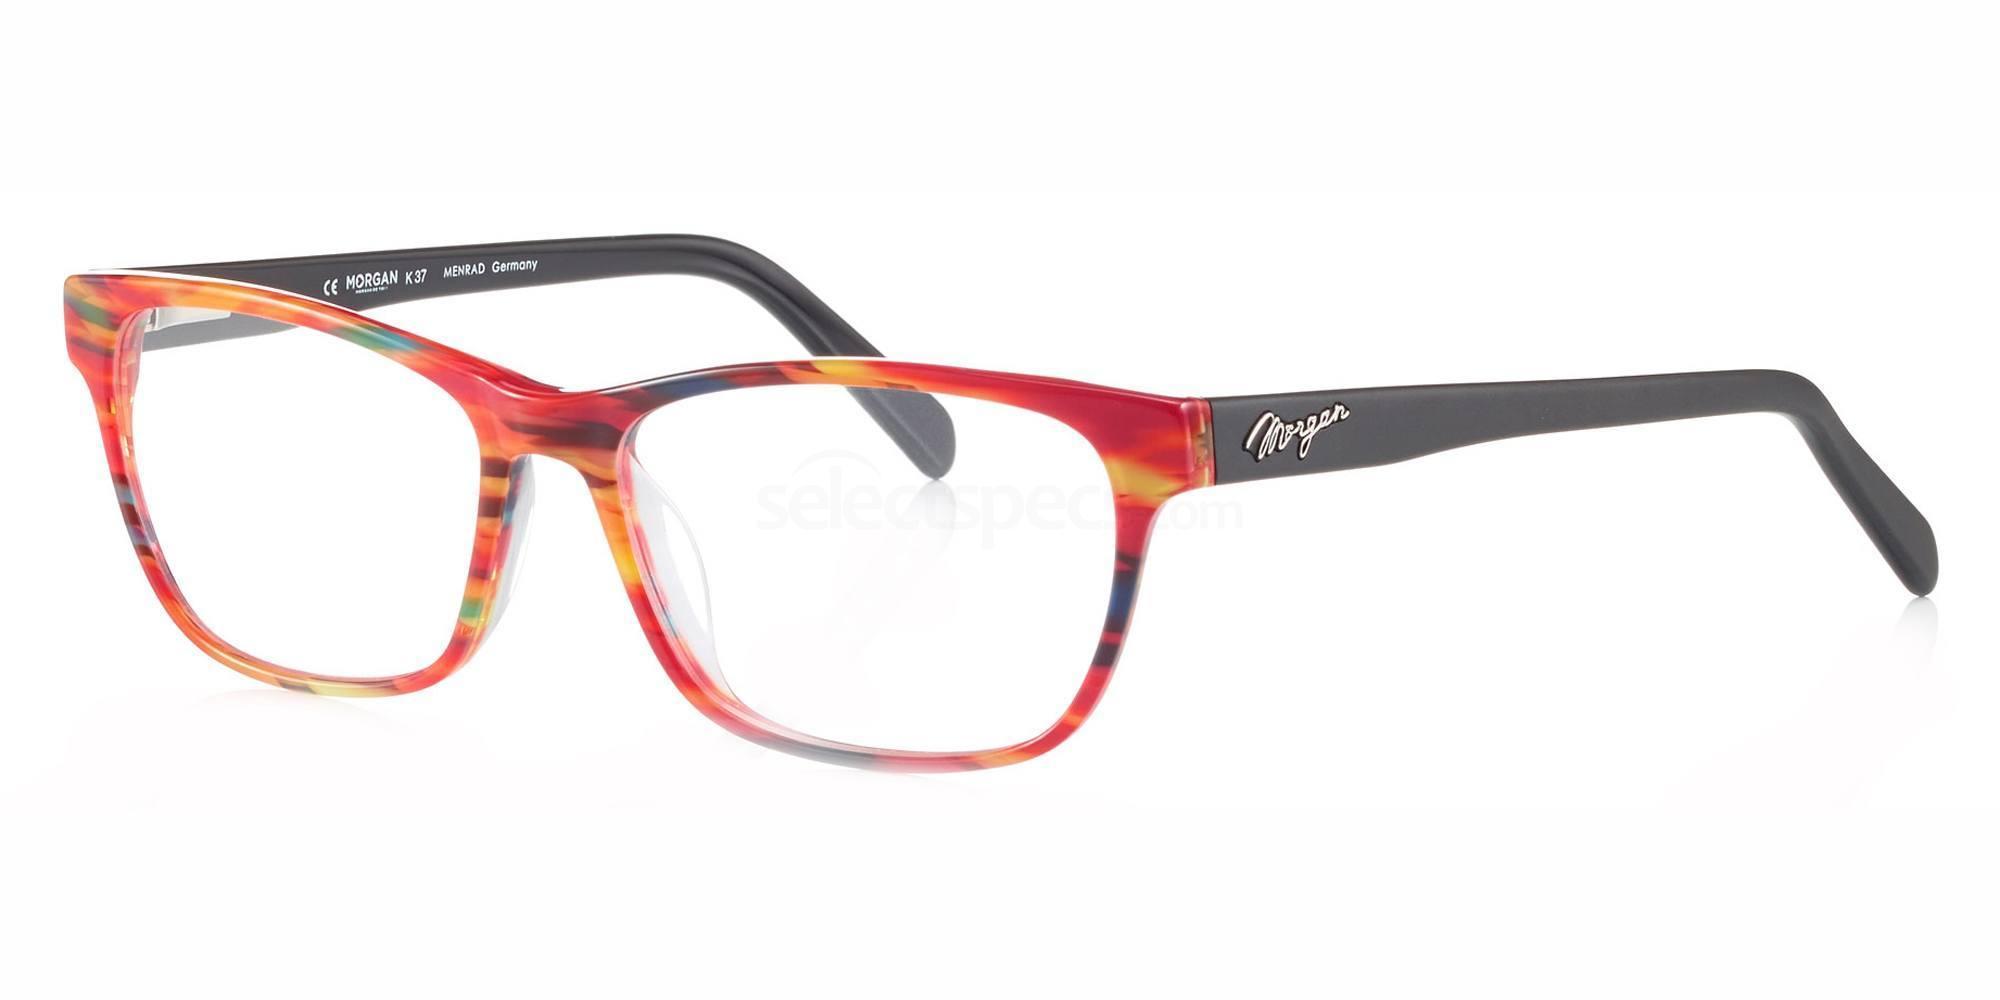 4225 201106 Glasses, MORGAN Eyewear